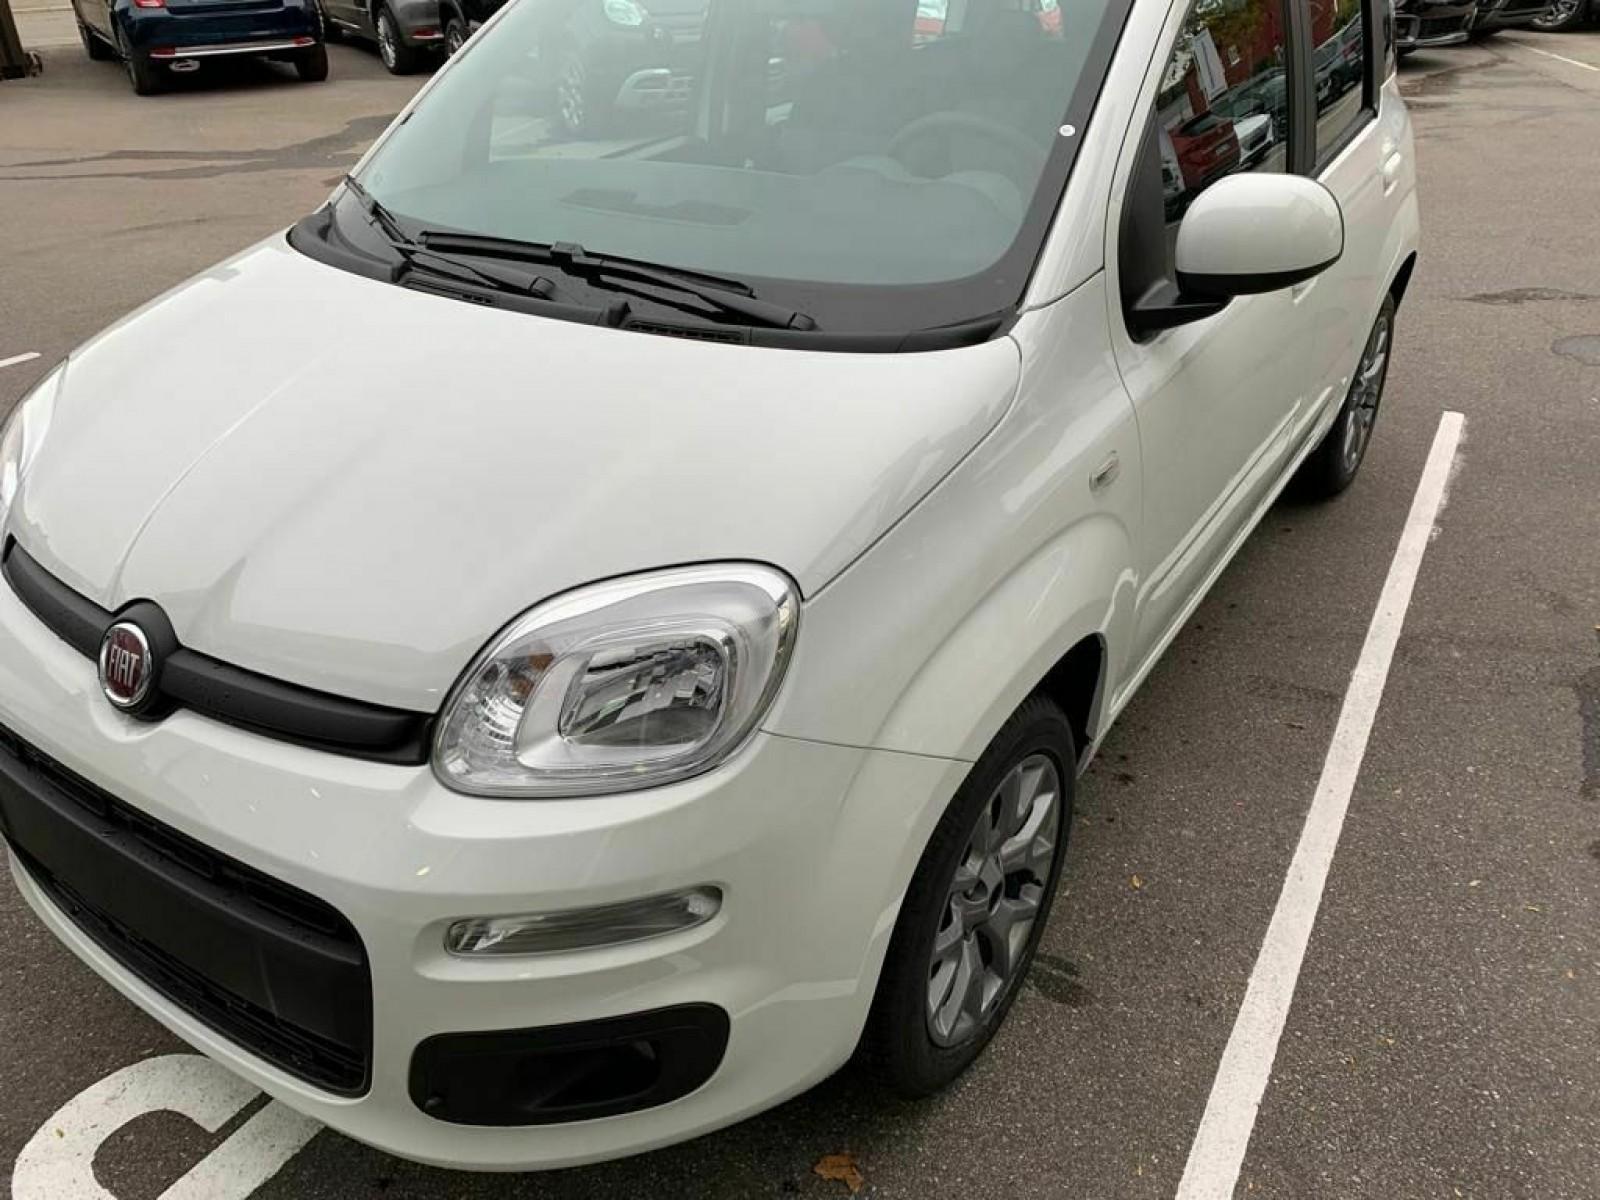 Fiat Panda 1.2 Lounge *KLIMA*BLUETOOTH, Jahr 2019, Benzin